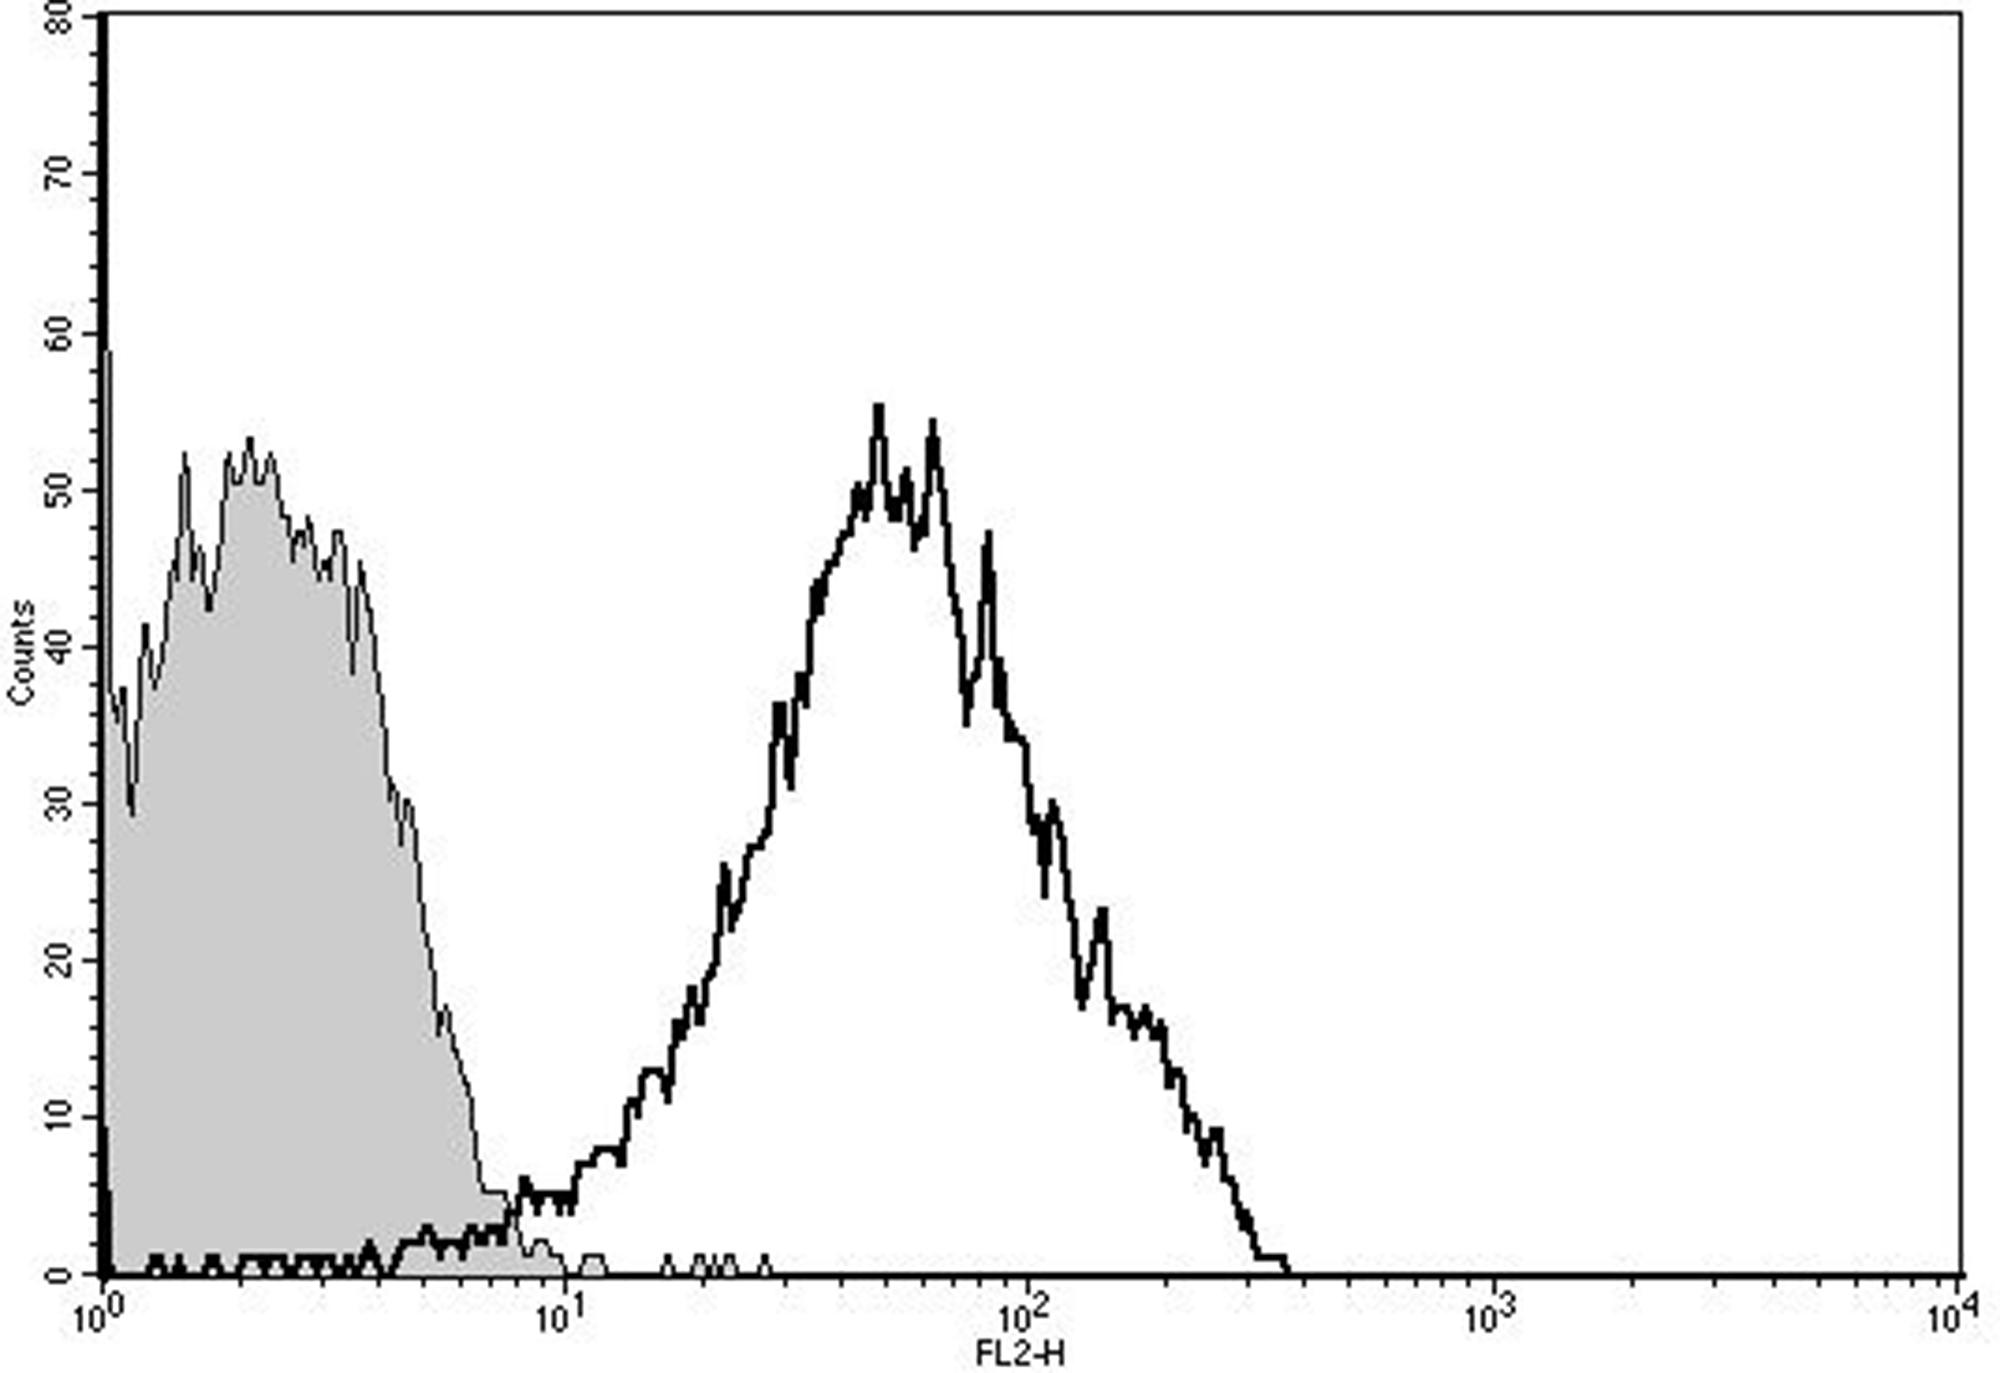 Doxorubicin loading in PMP analyzed by flow cytometry.